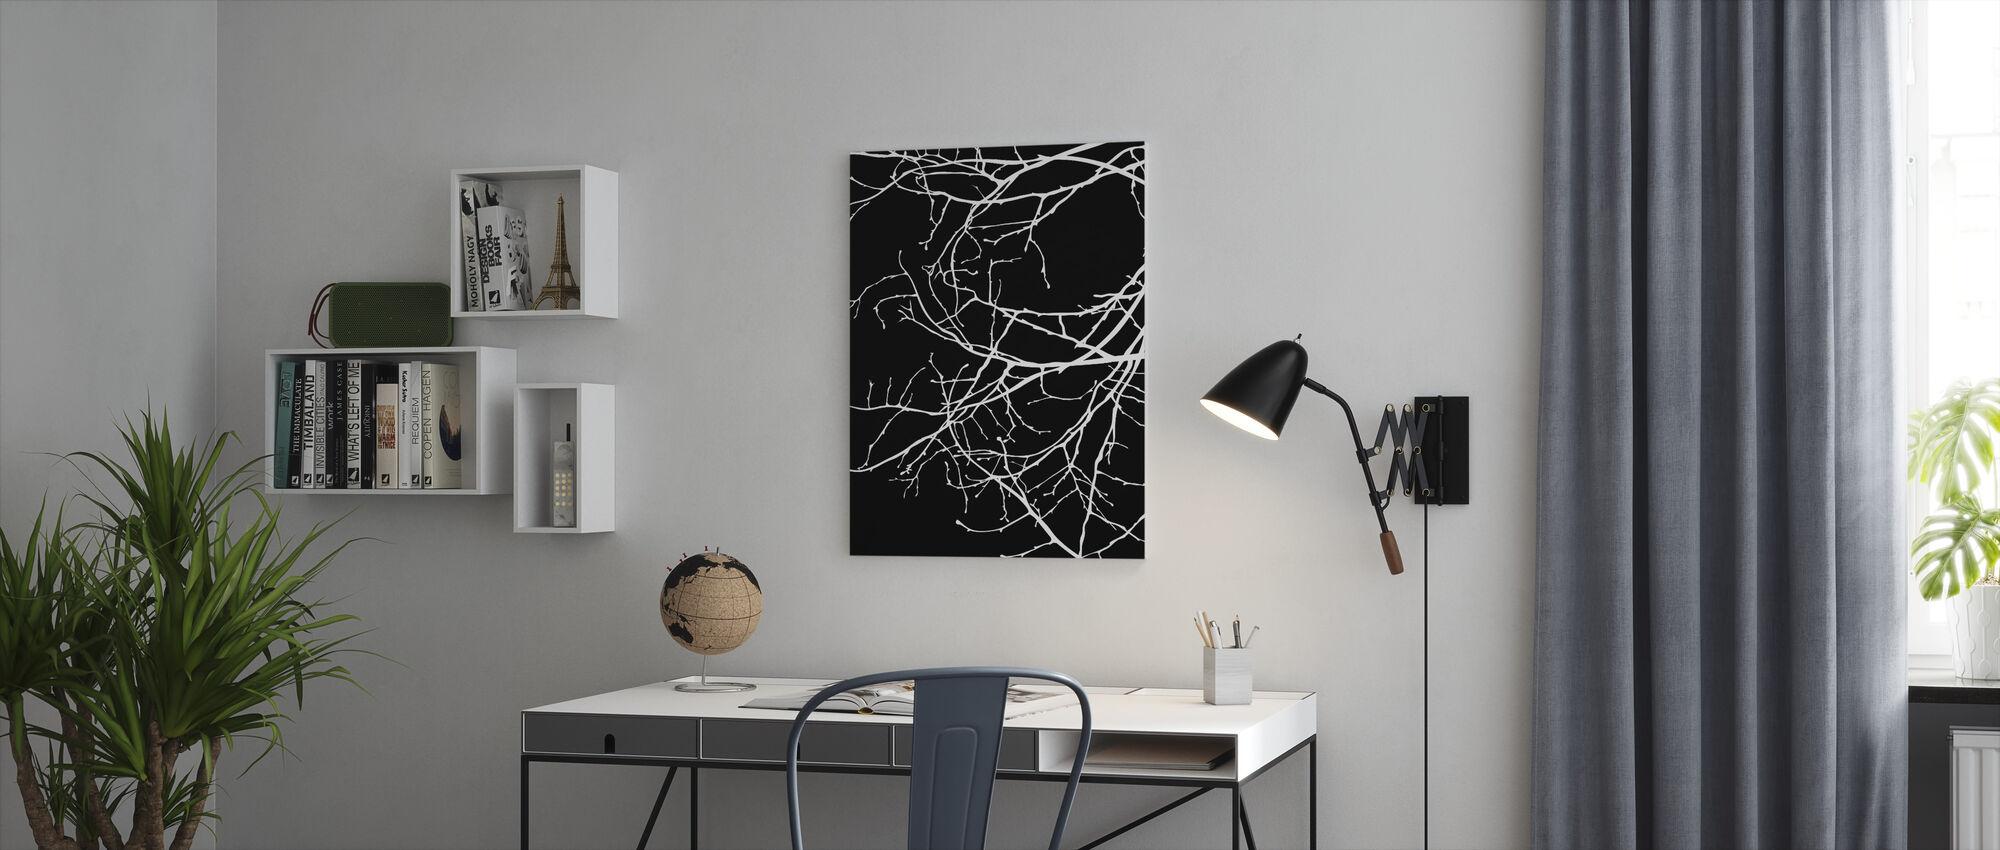 Twiggy - White - Canvas print - Office